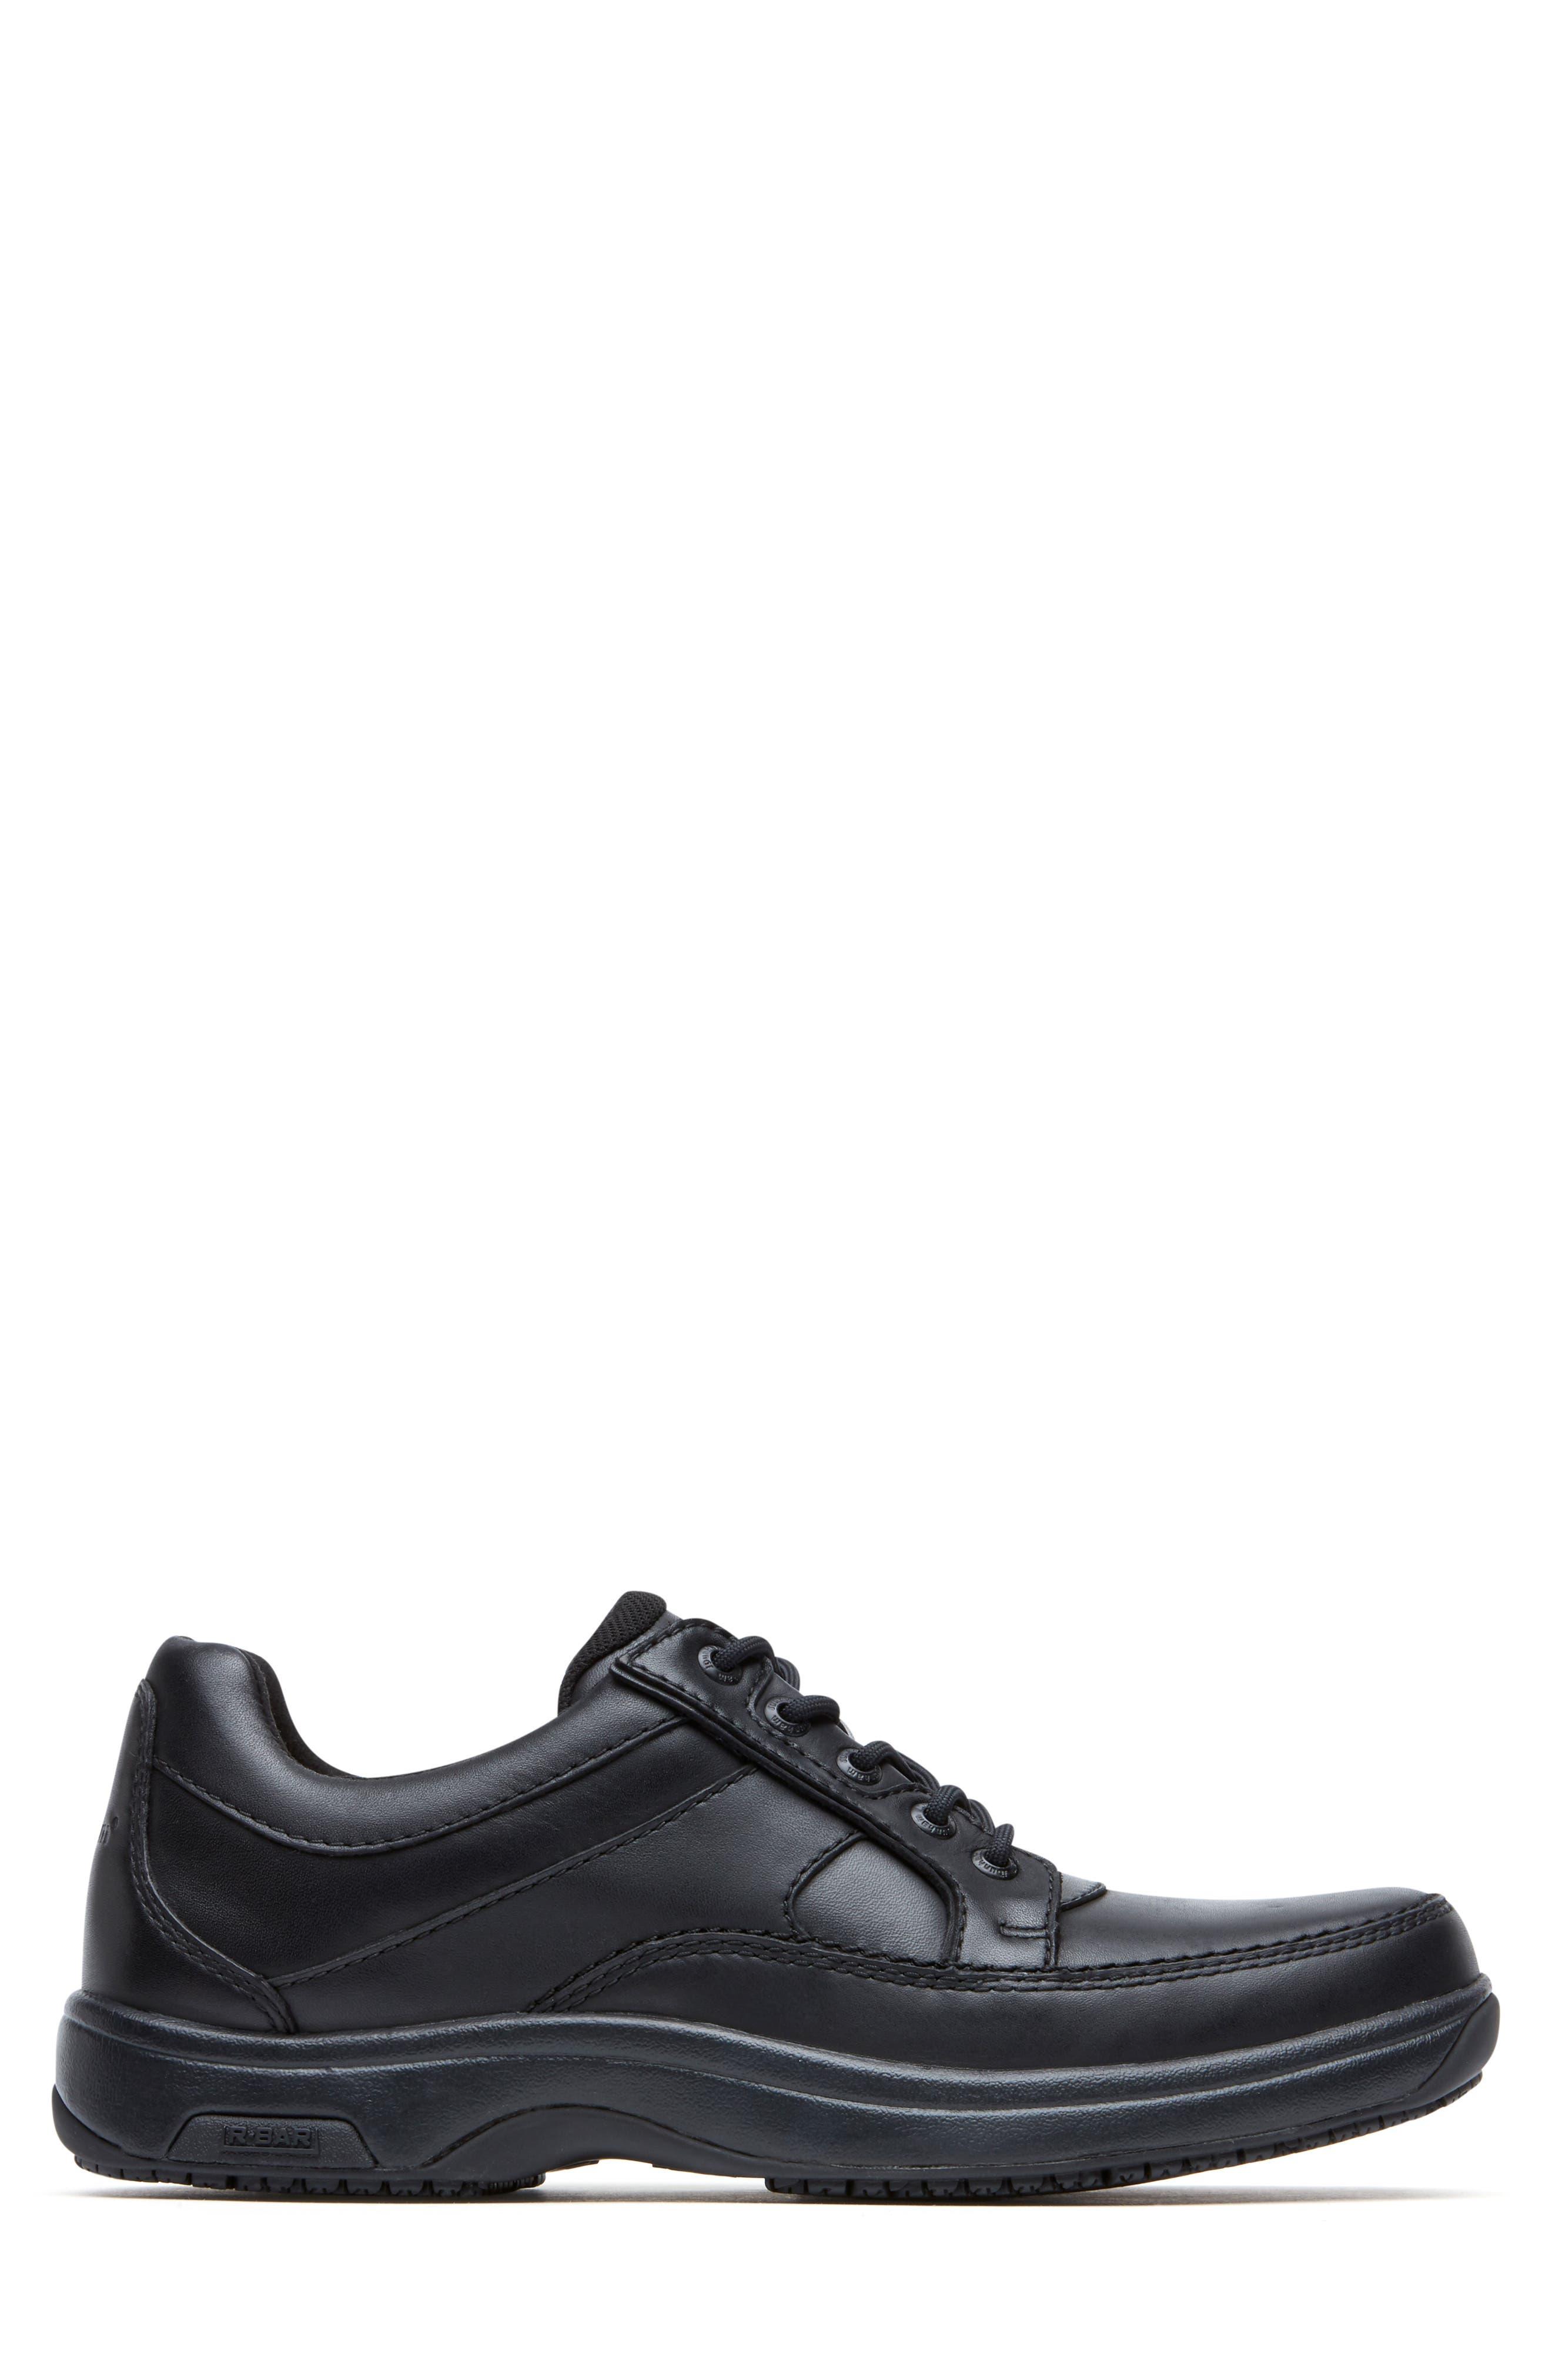 DUNHAM, 'Midland' Sneaker, Alternate thumbnail 3, color, BLACK LEATHER